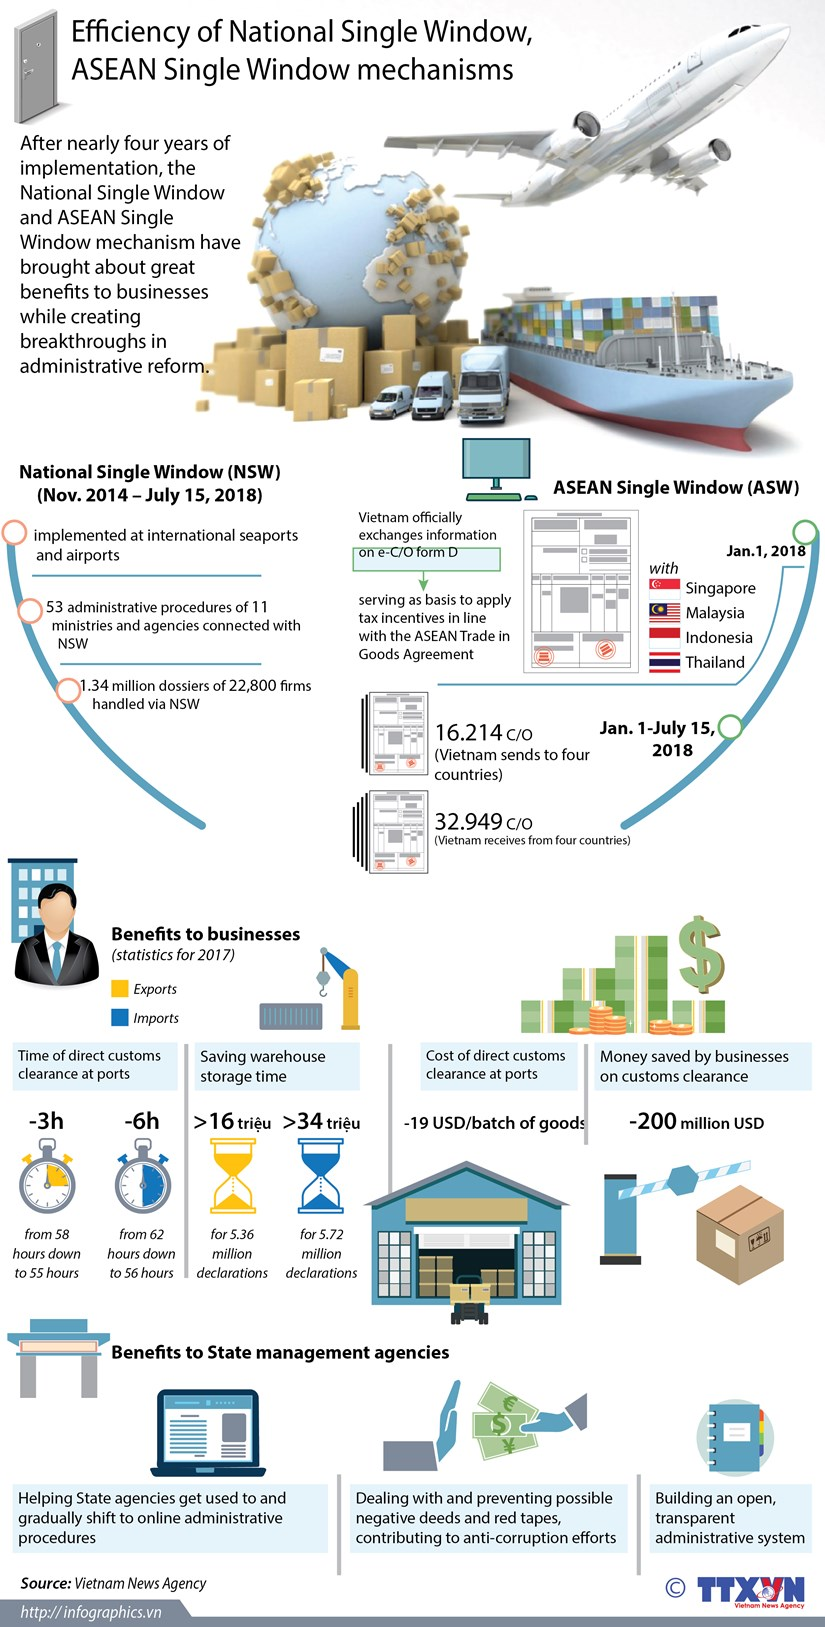 Efficiency of National Single Window, ASEAN Single Window mechanisms hinh anh 1